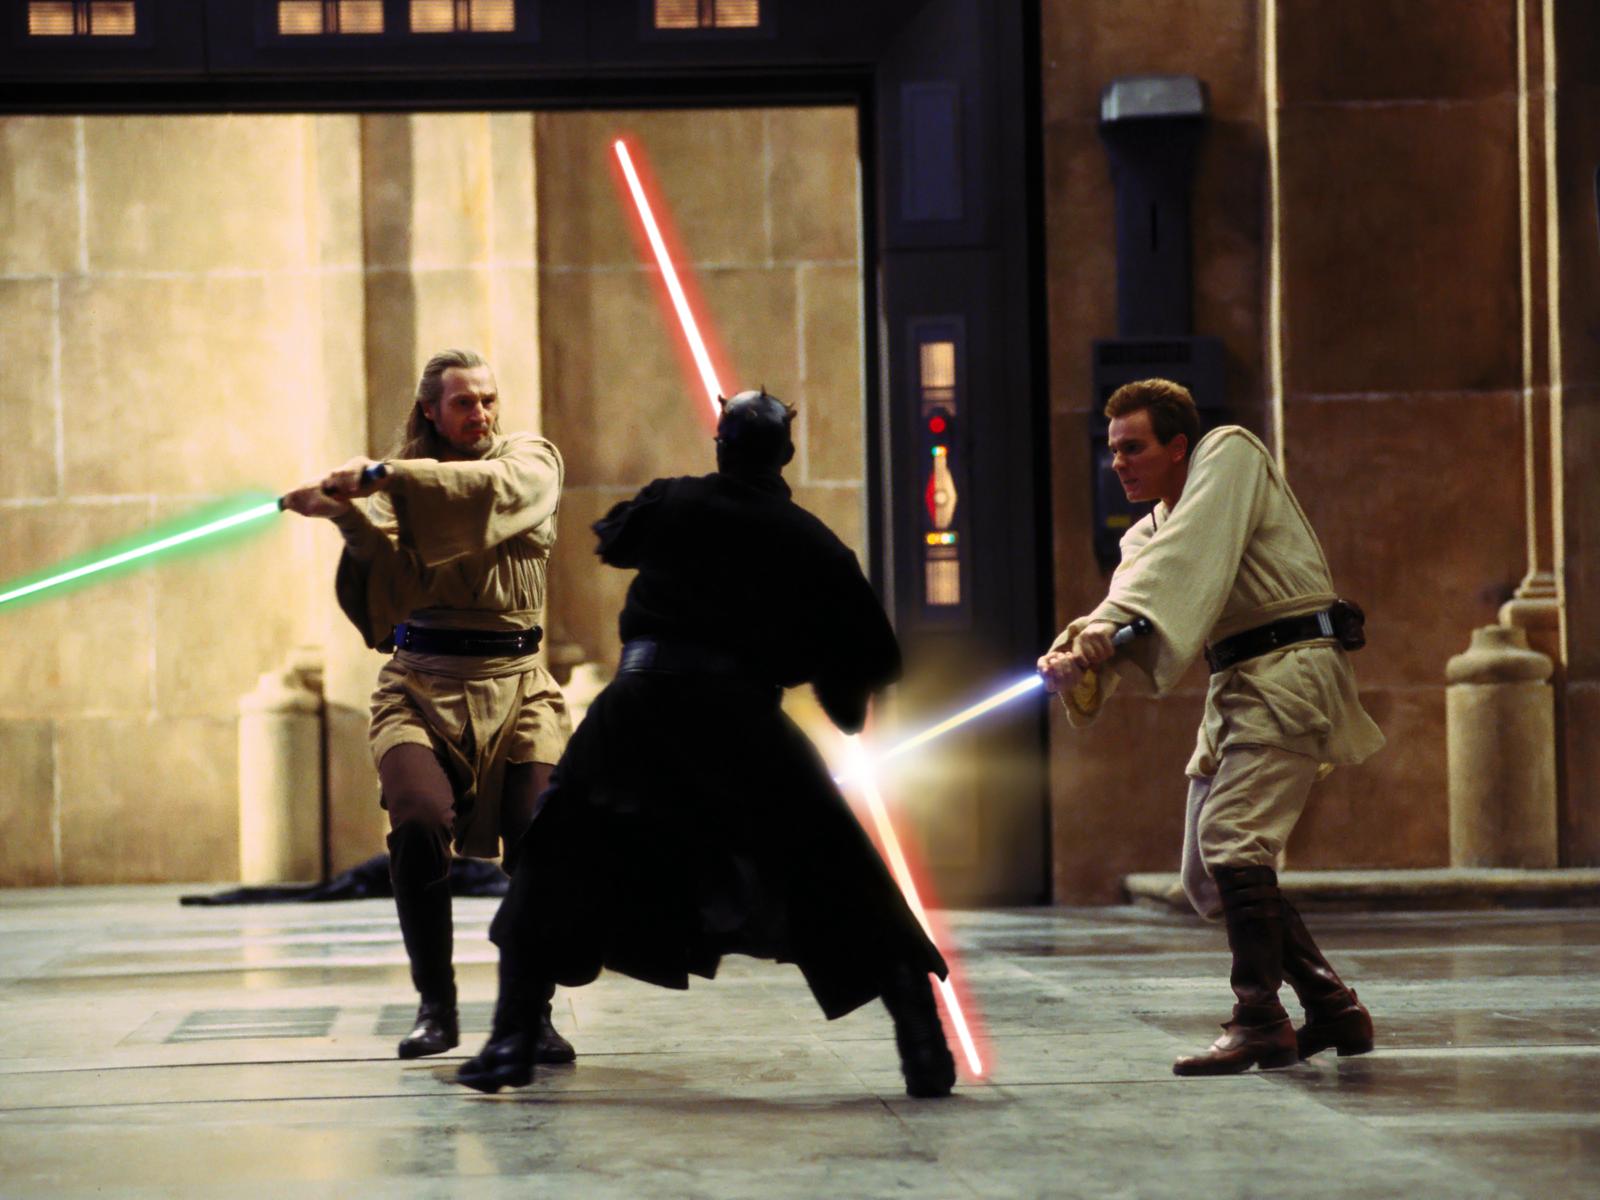 Star Wars: Episode I The Phantom Menace | Wookieepedia